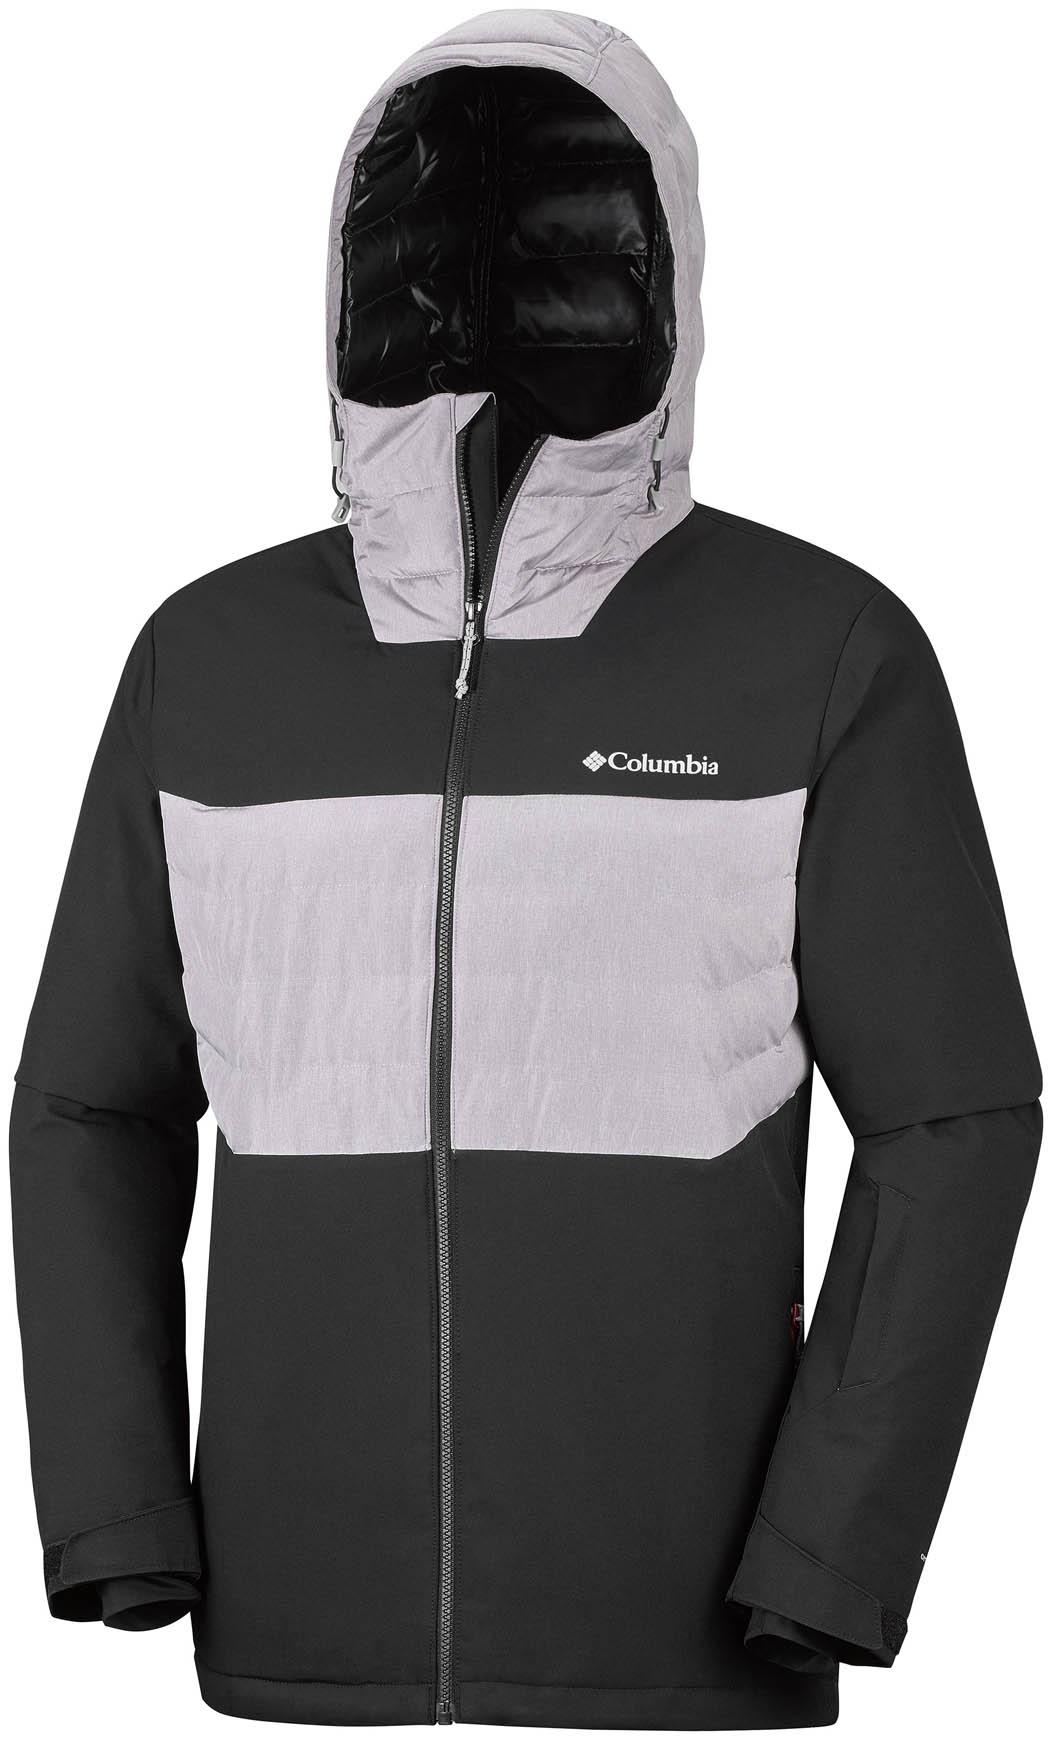 Ski Vestes M Columbia Jacket Hybrid Horizon Blackastral White wxO074q7